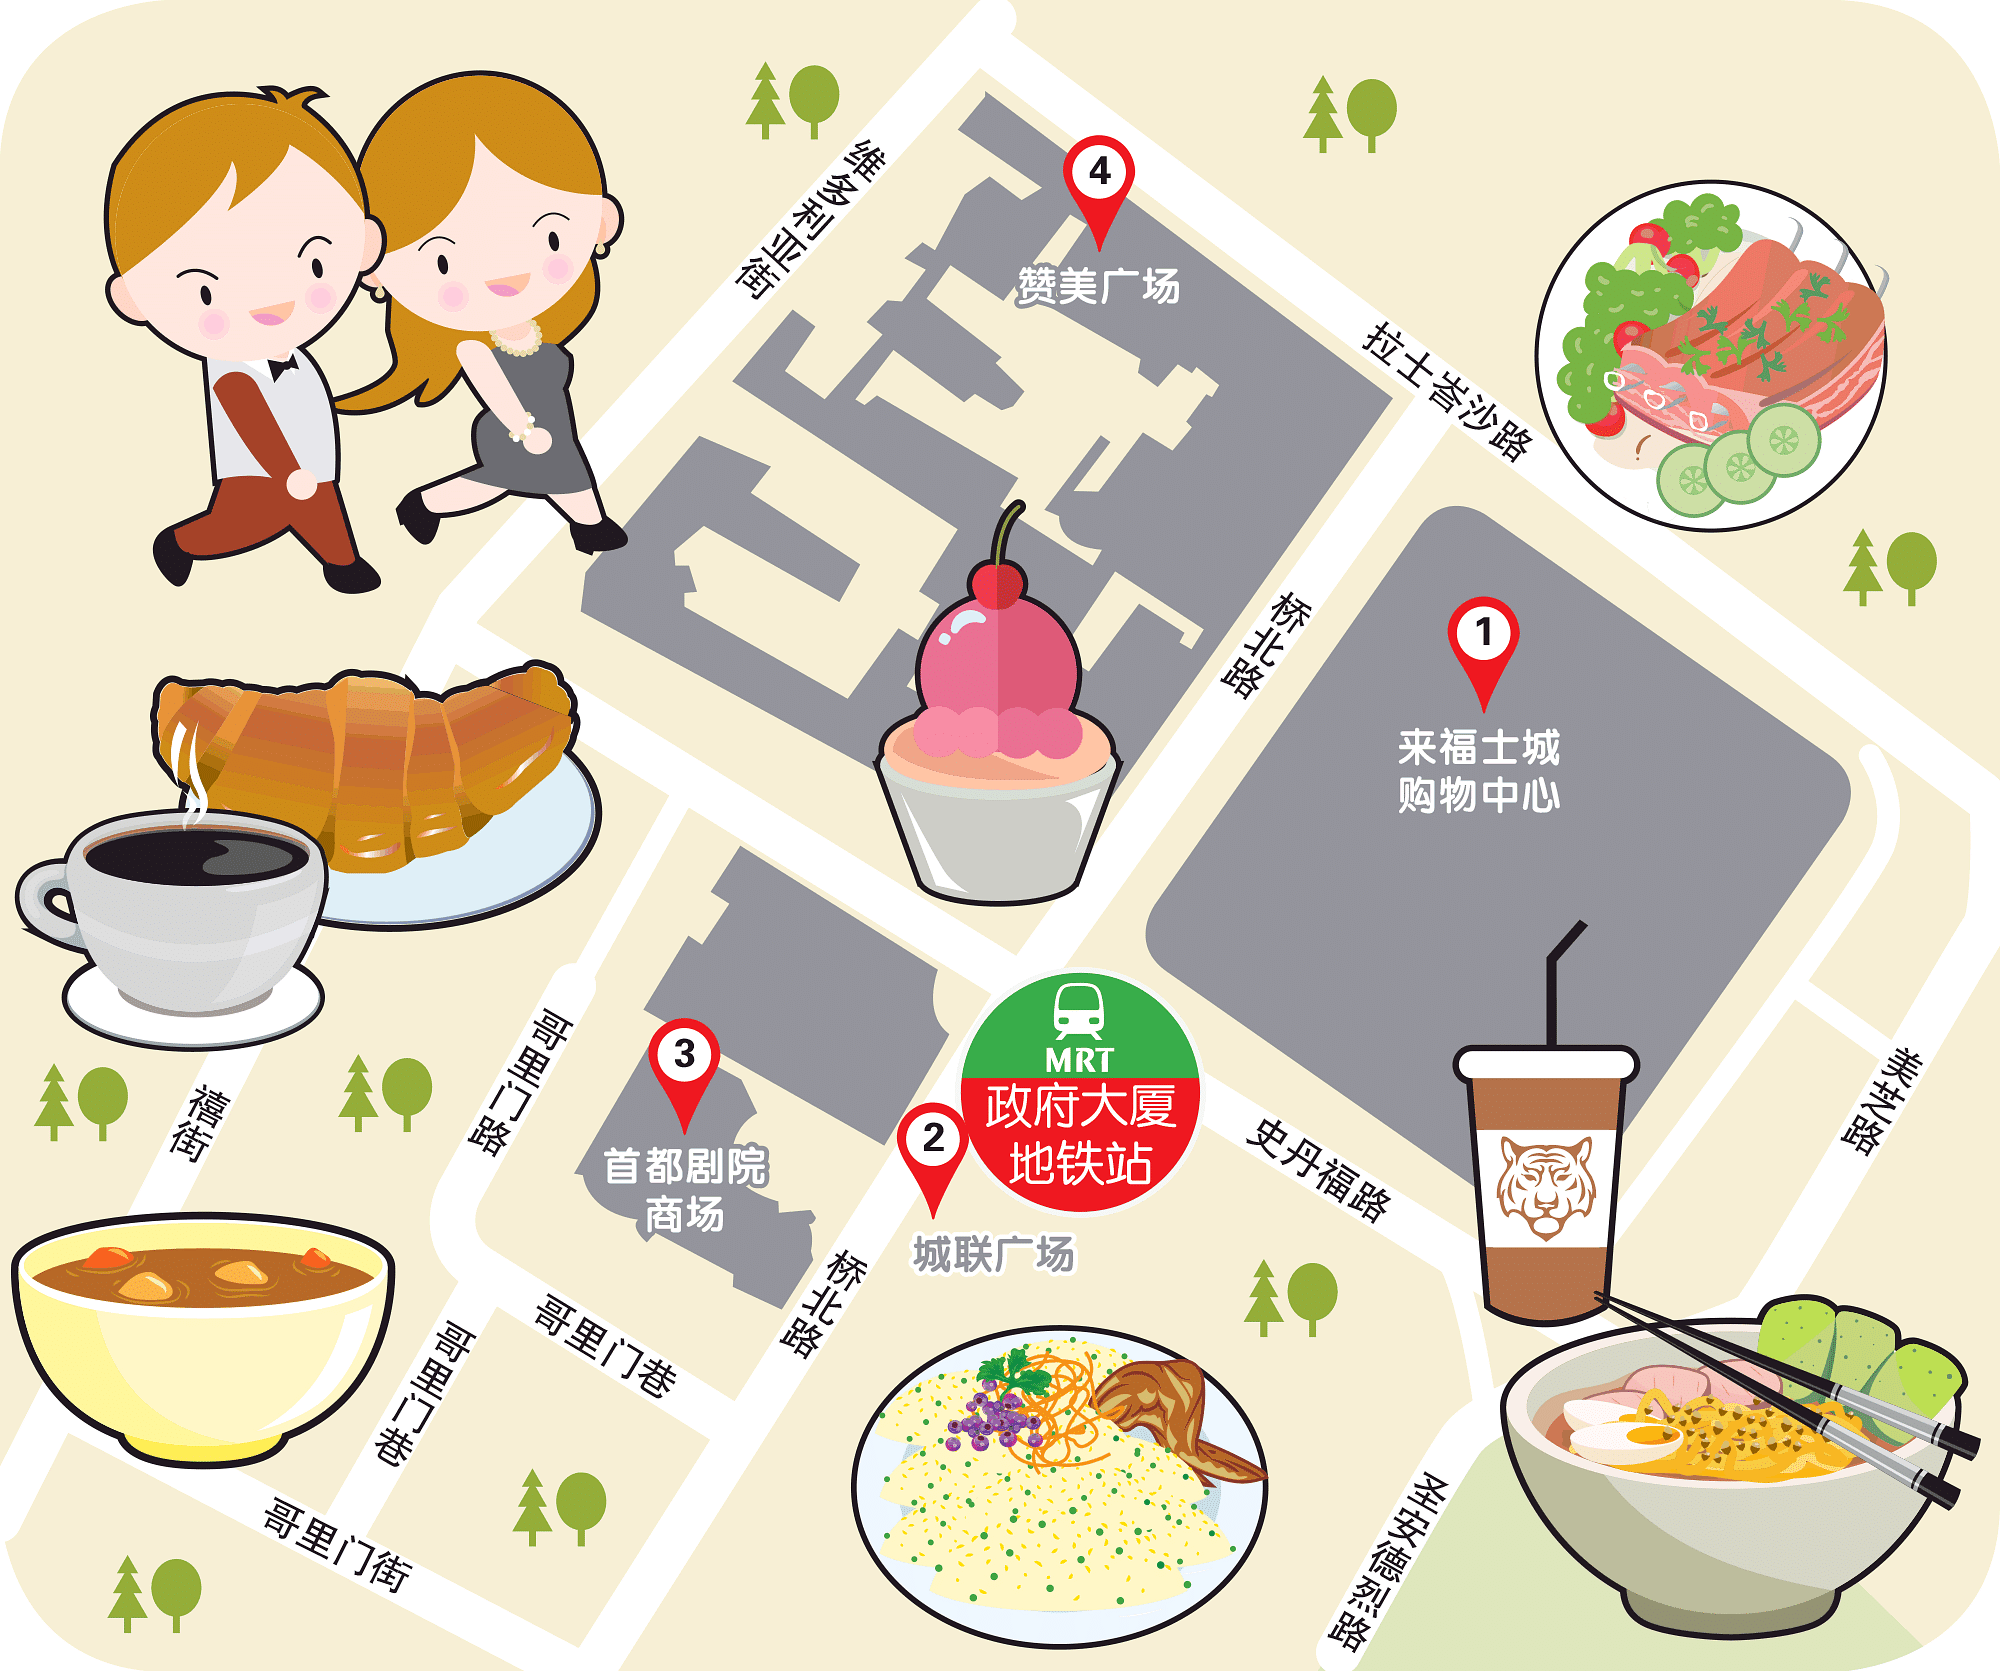 Wanbao Food Search @City Hall MRT Station